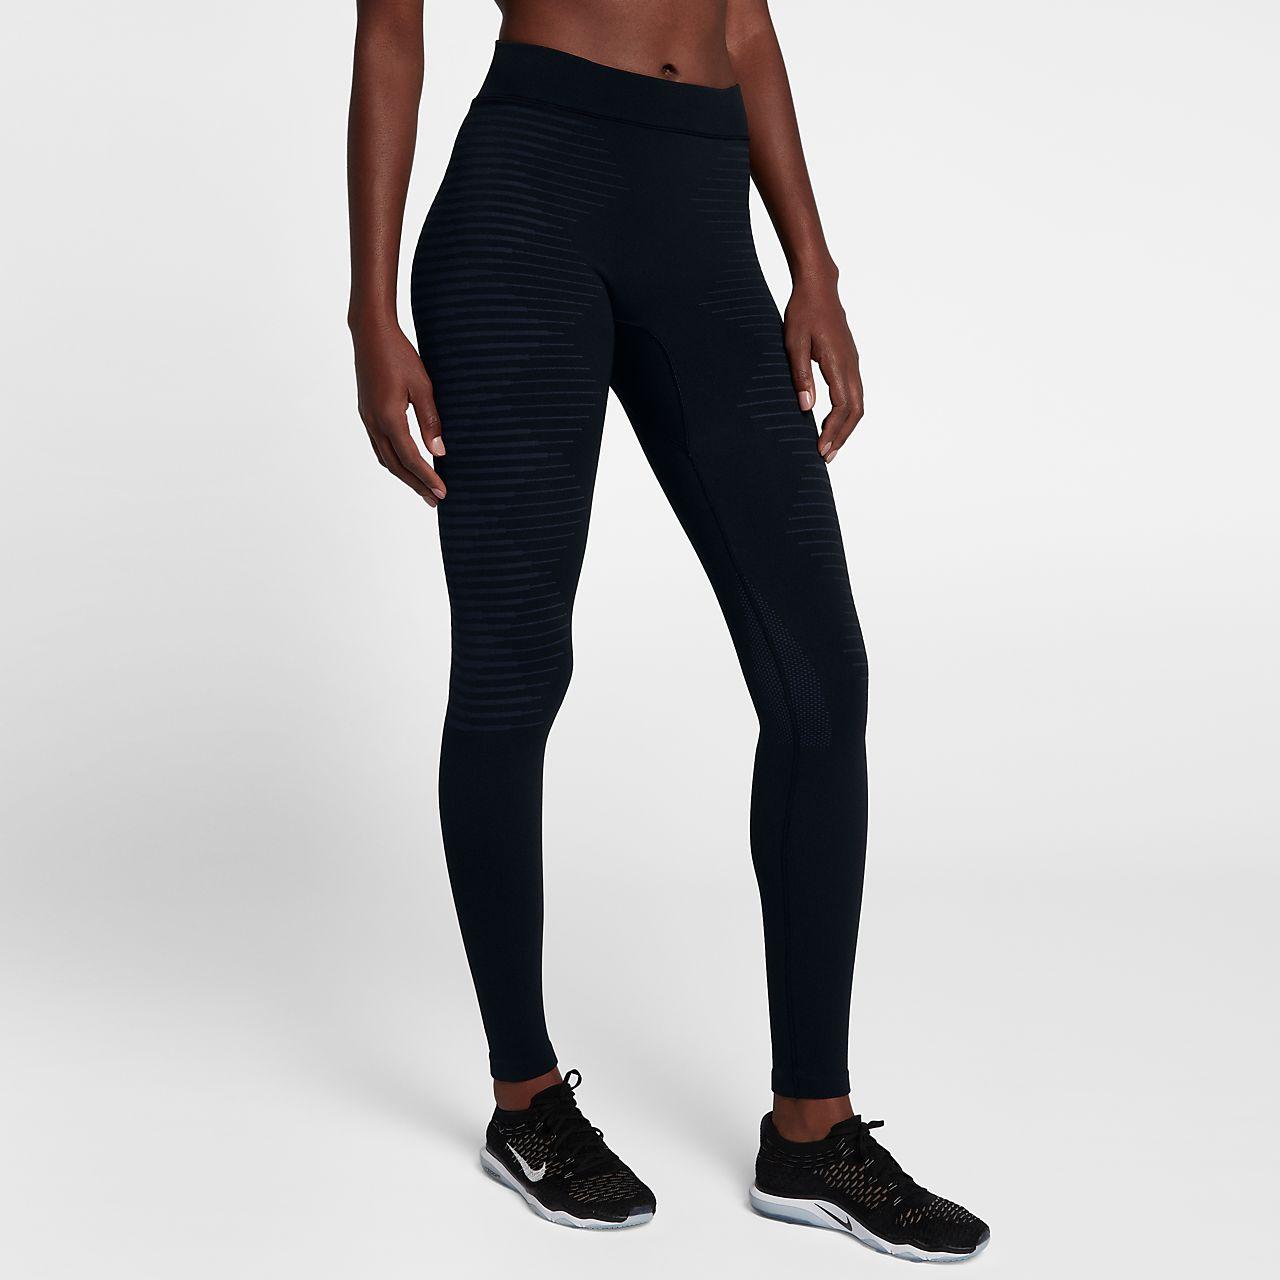 Nike Pro HyperWarm Womenu0026#39;s Training Tights. Nike.com